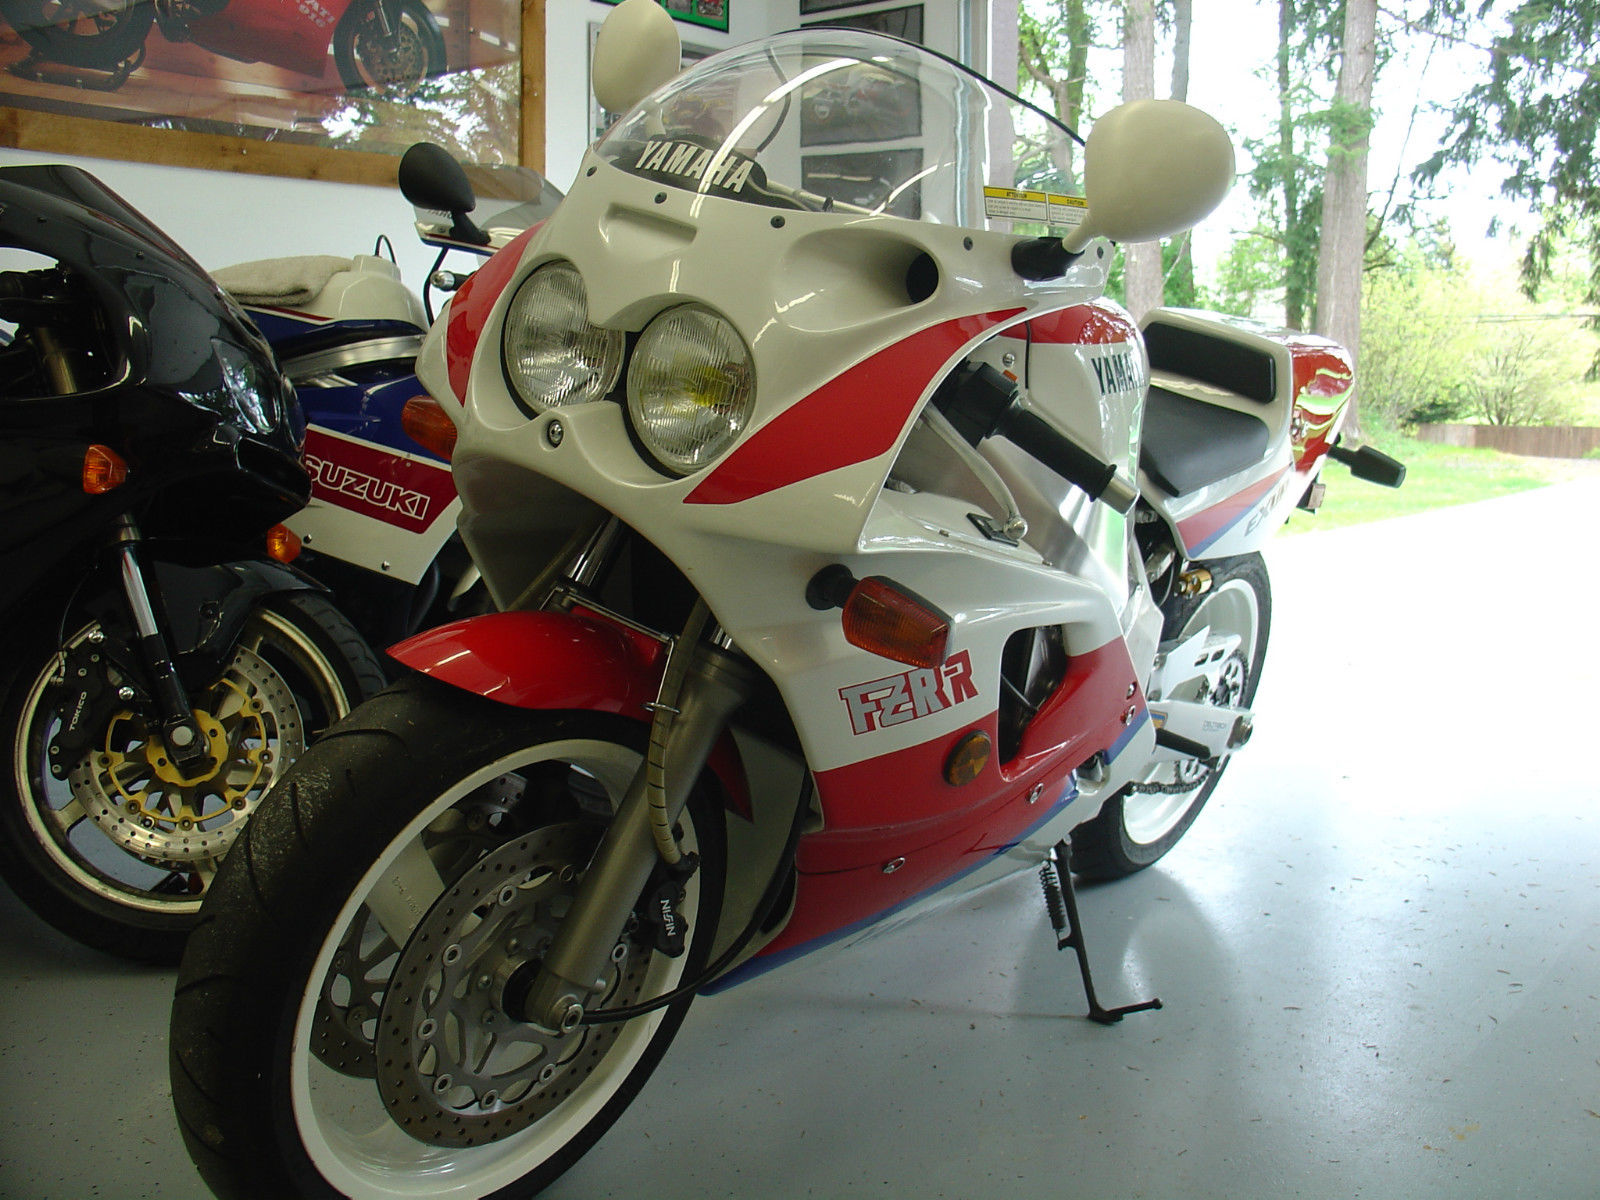 Yamaha Ow01 For Sale >> 1990 #Yamaha #FZR750R #OW01 for sale – thecherrycreeknews.com